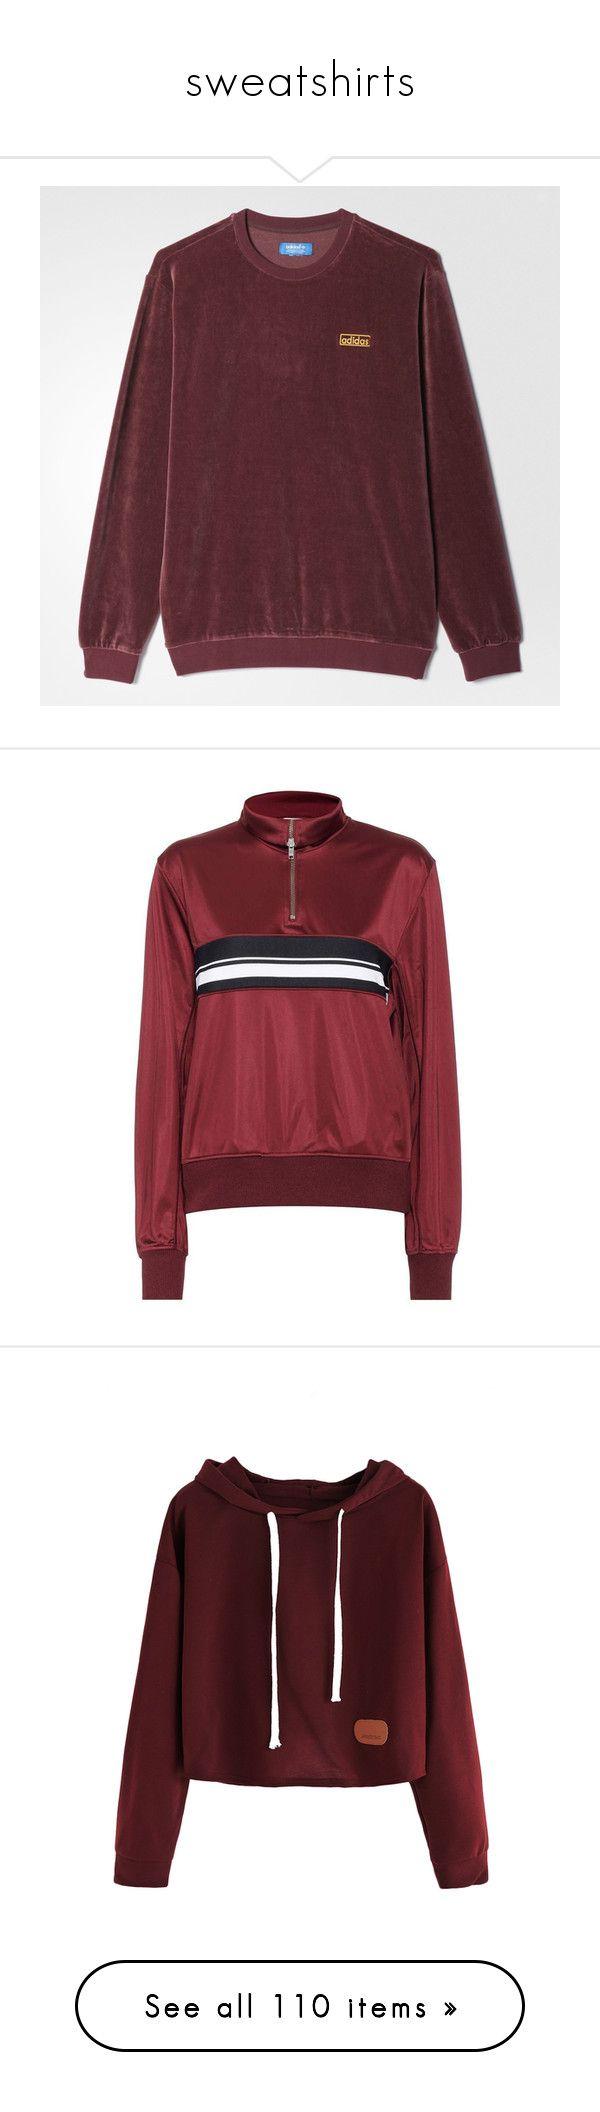 """sweatshirts"" by harthkai on Polyvore featuring tops, hoodies, sweatshirts, sueteres, adidas sweatshirt, red sweatshirt, velour top, brown top, red top and sweaters"